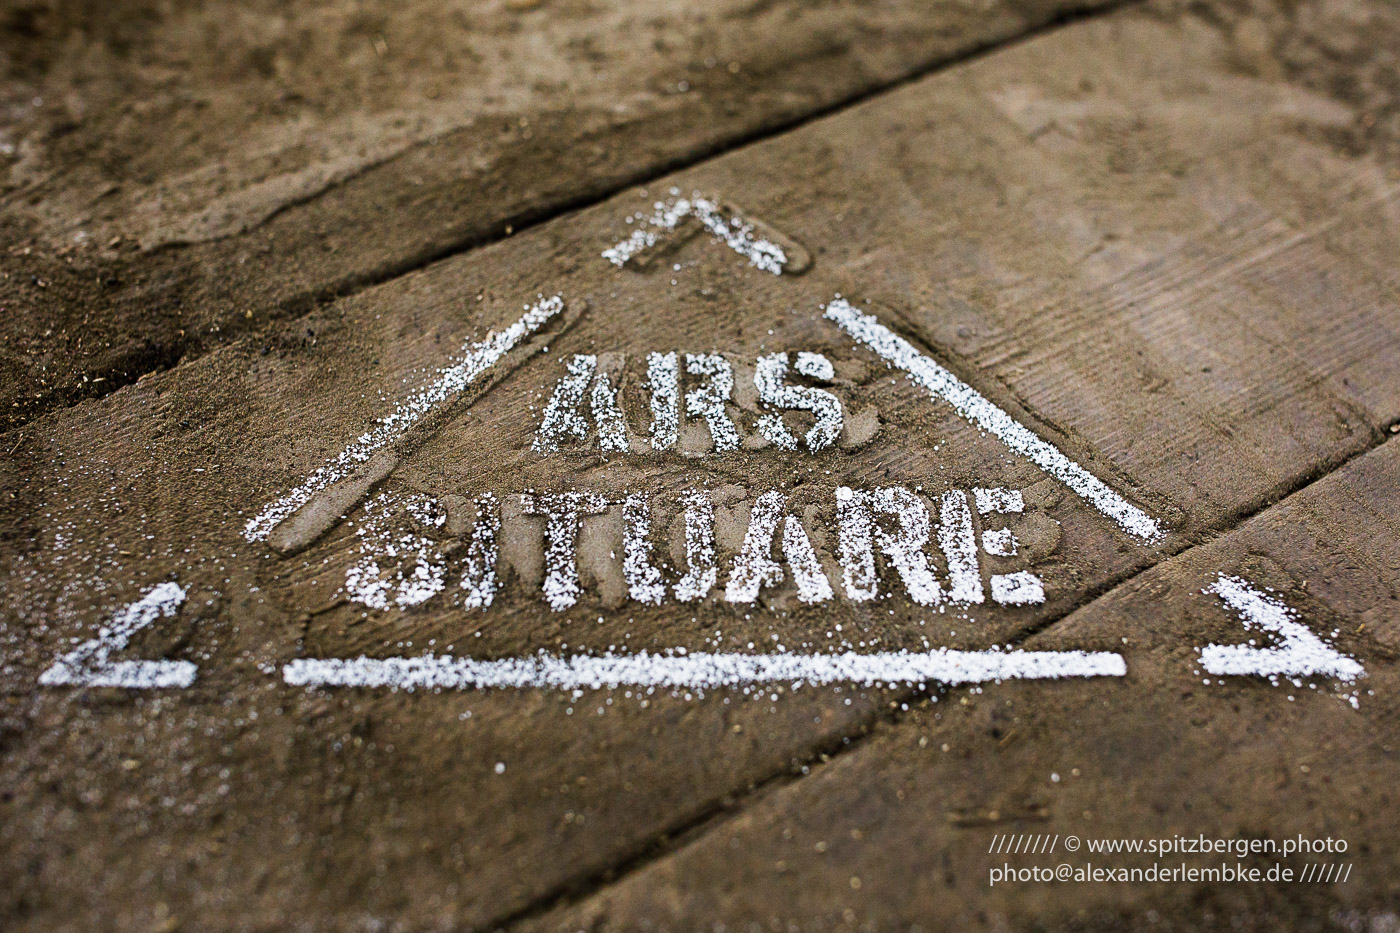 ARS_SITUARE_PHOTO@ALEXANDER_LEMBKE_DE_15